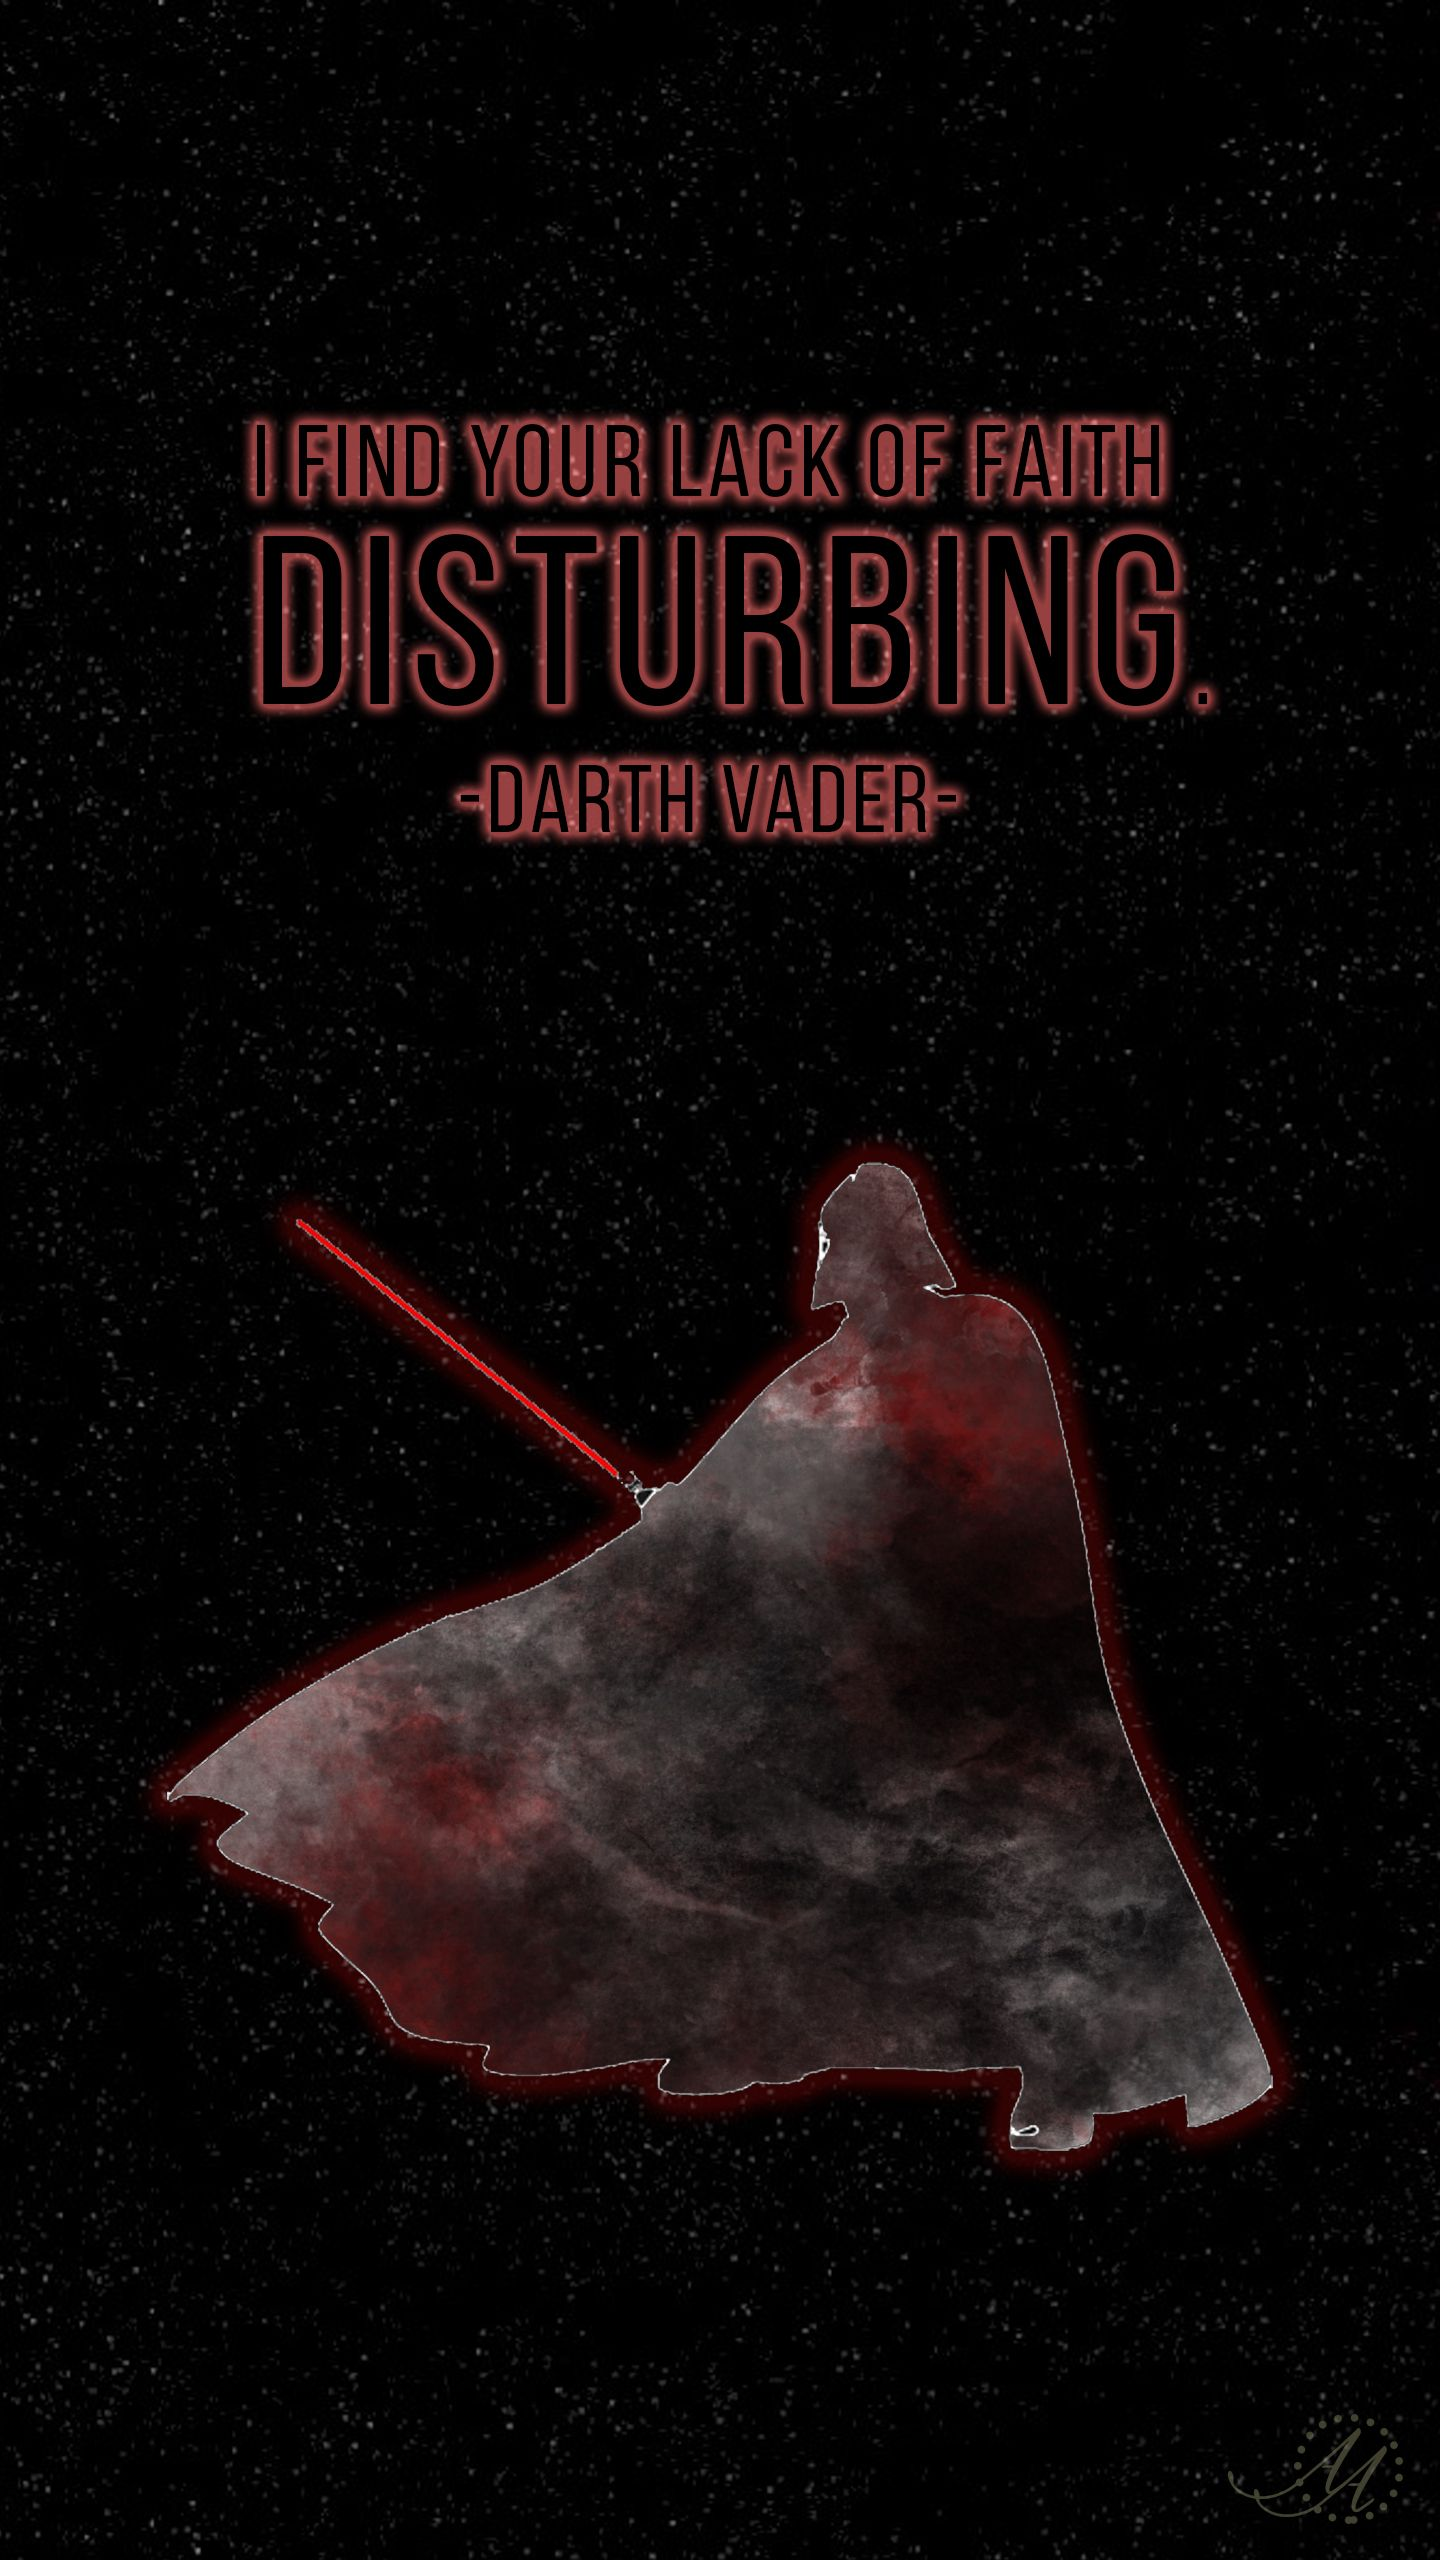 I Find Your Lack Of Faith Disturbing Darth Vader Star Wars